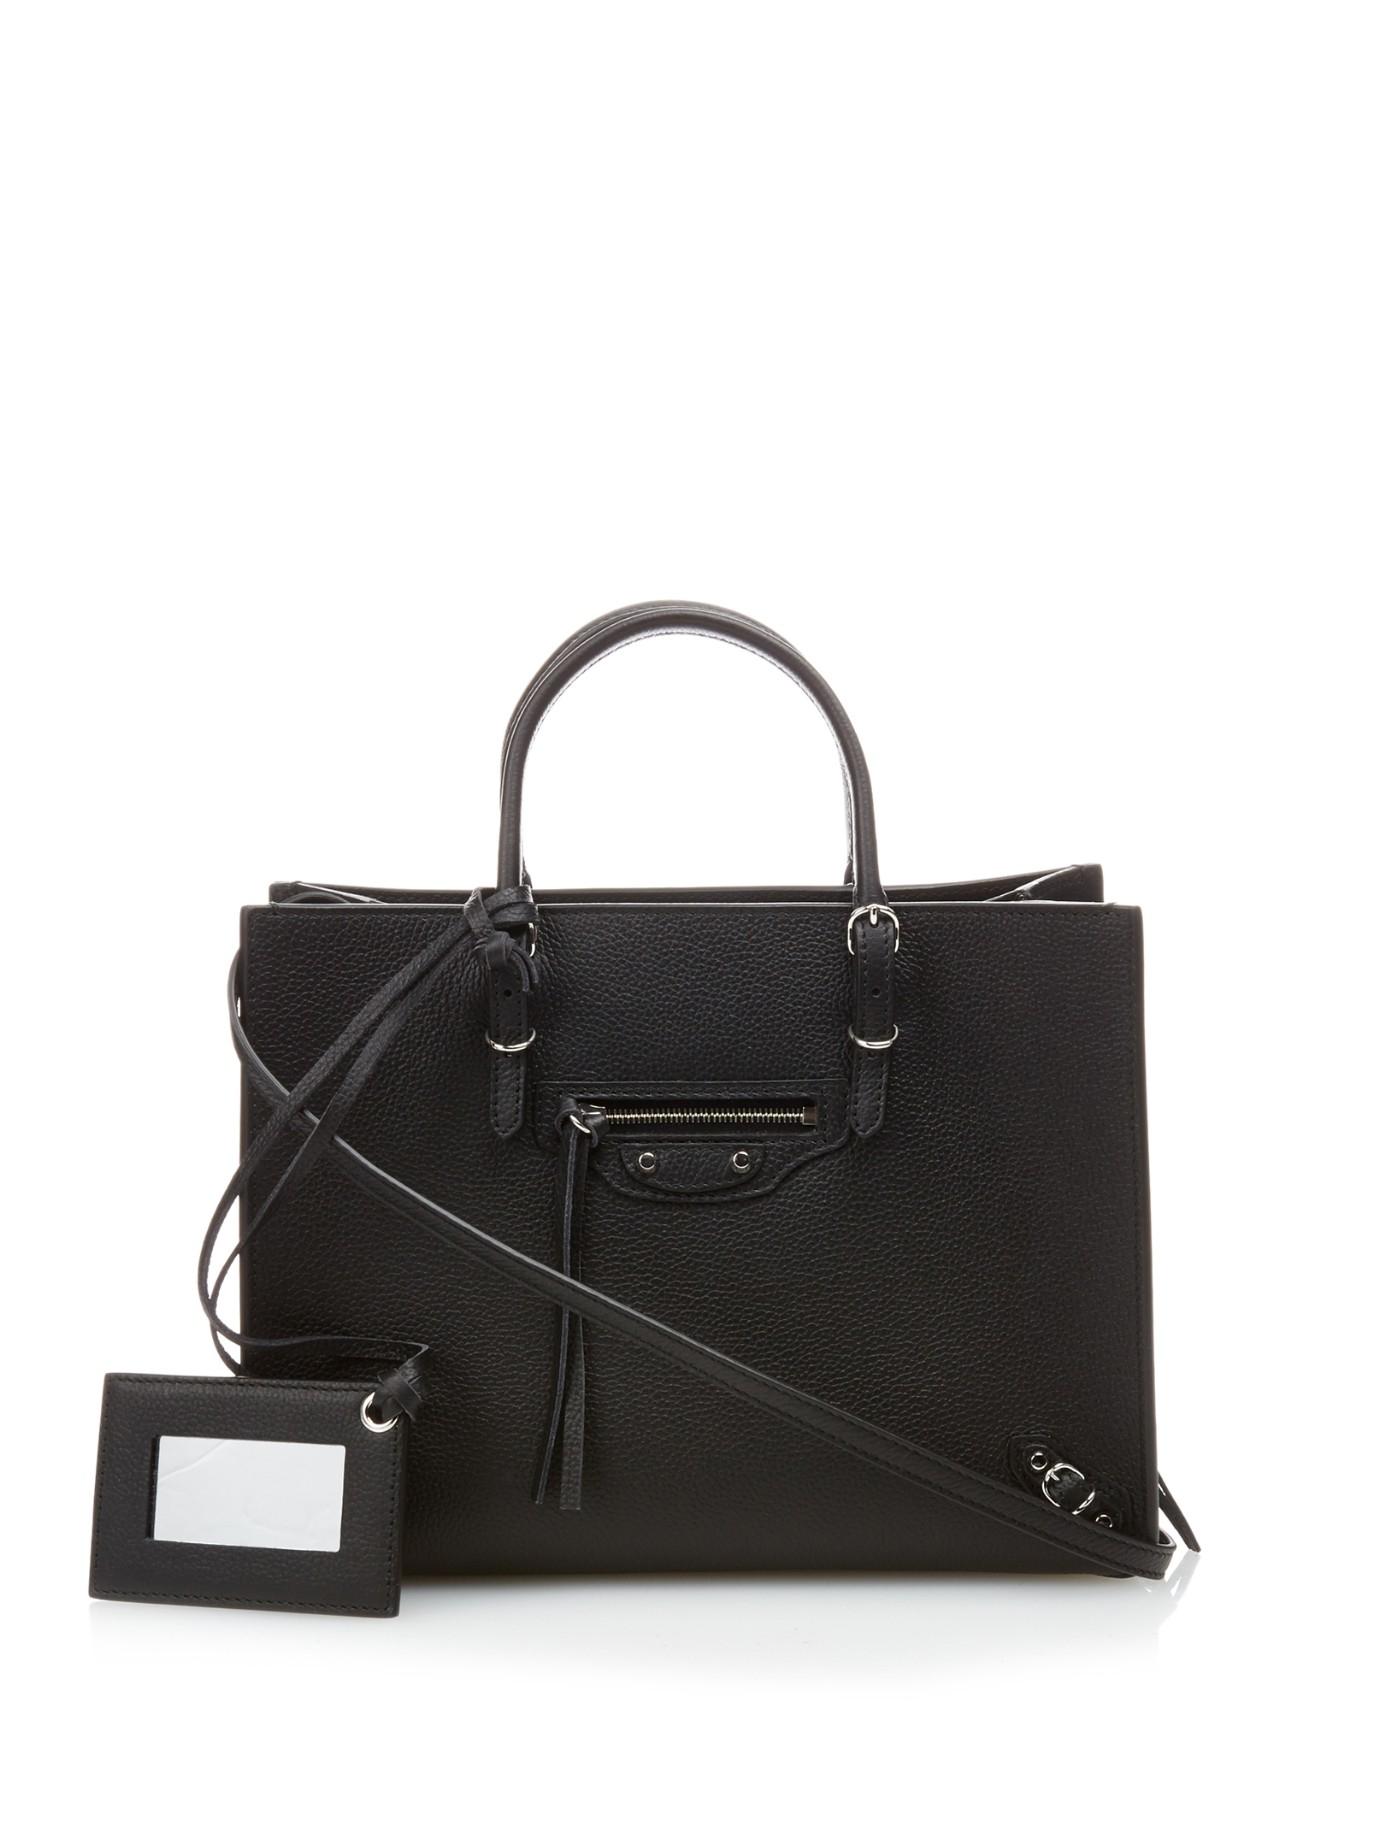 689f24320d5 Balenciaga Papier A6 Grained-leather Cross-body Bag in Black - Lyst